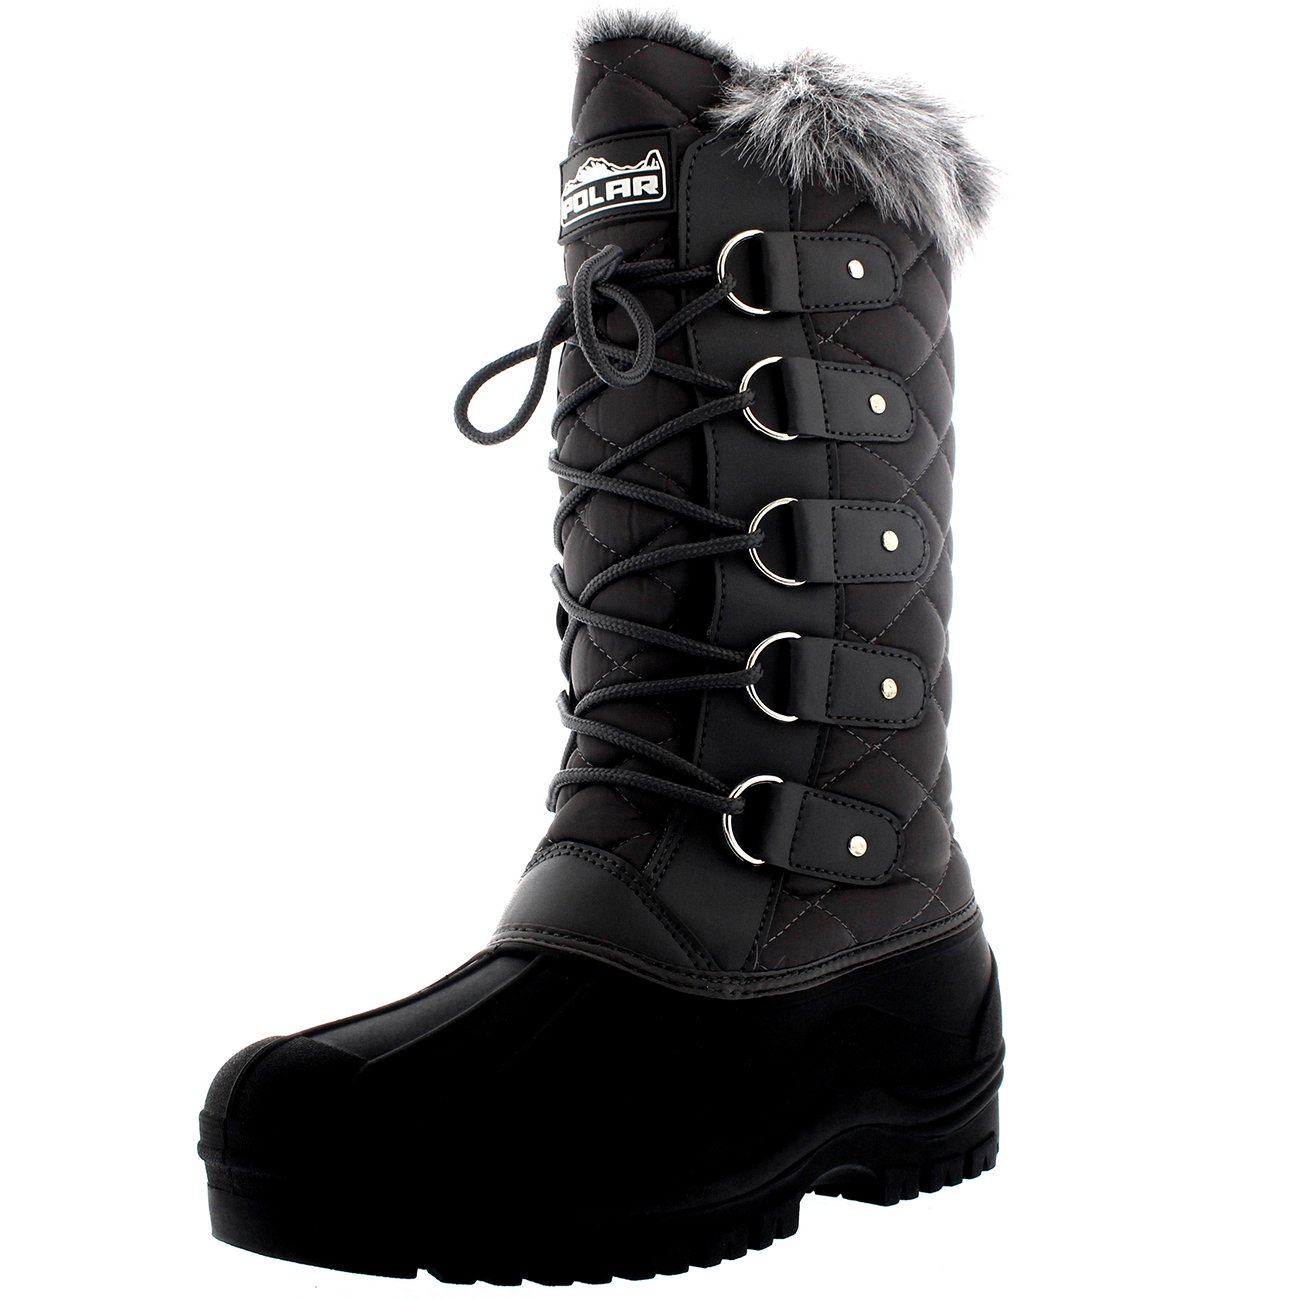 Womens Waterproof Tactical Mountain Walking Snow Knee Boots B01GMU45HA 11 B(M) US|Gray